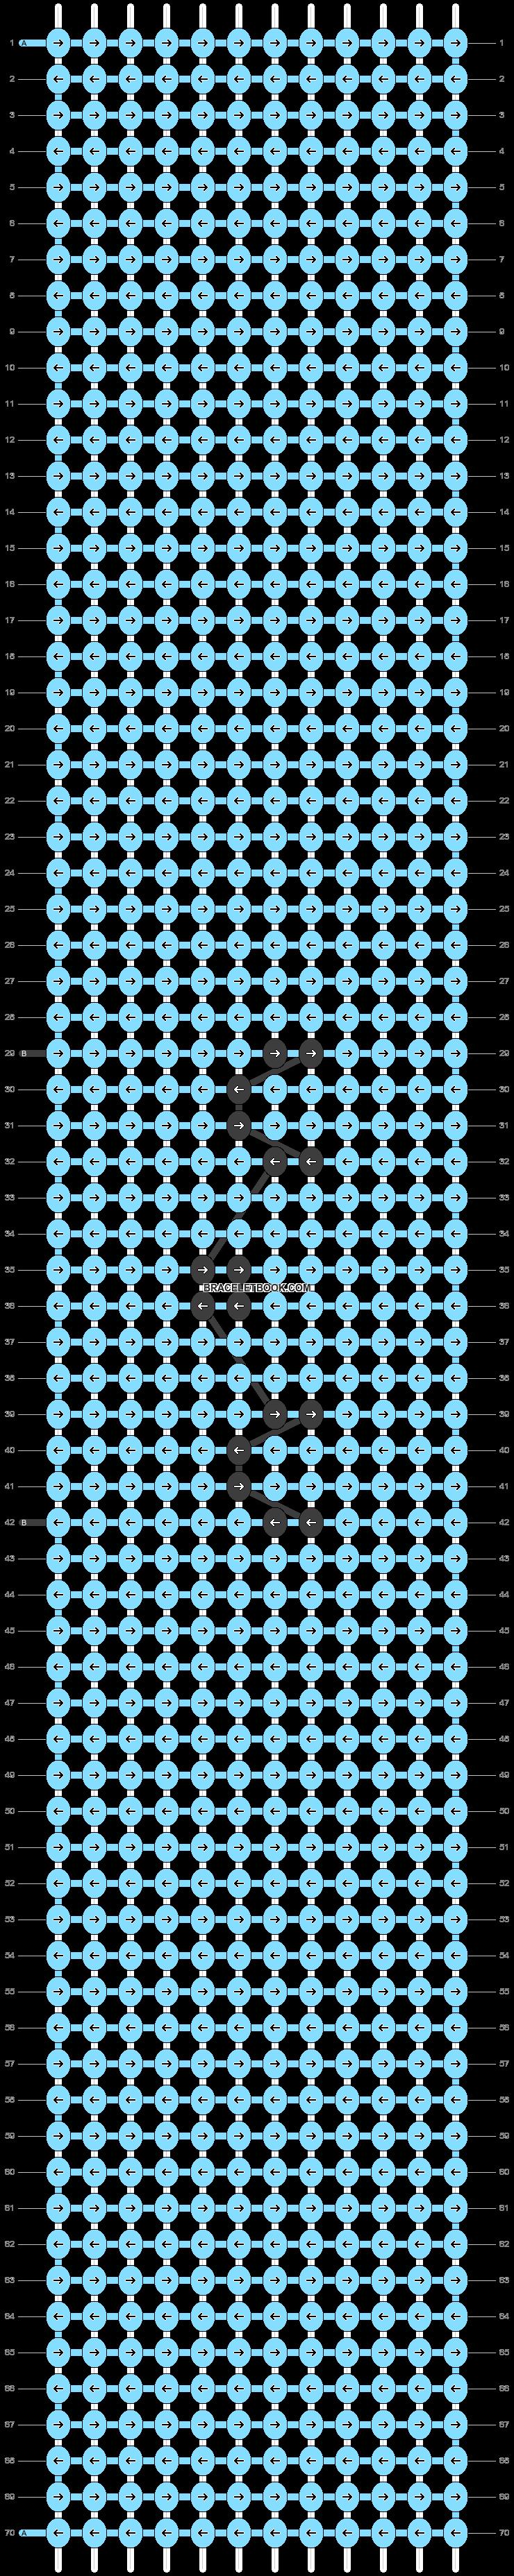 Alpha pattern #46178 pattern